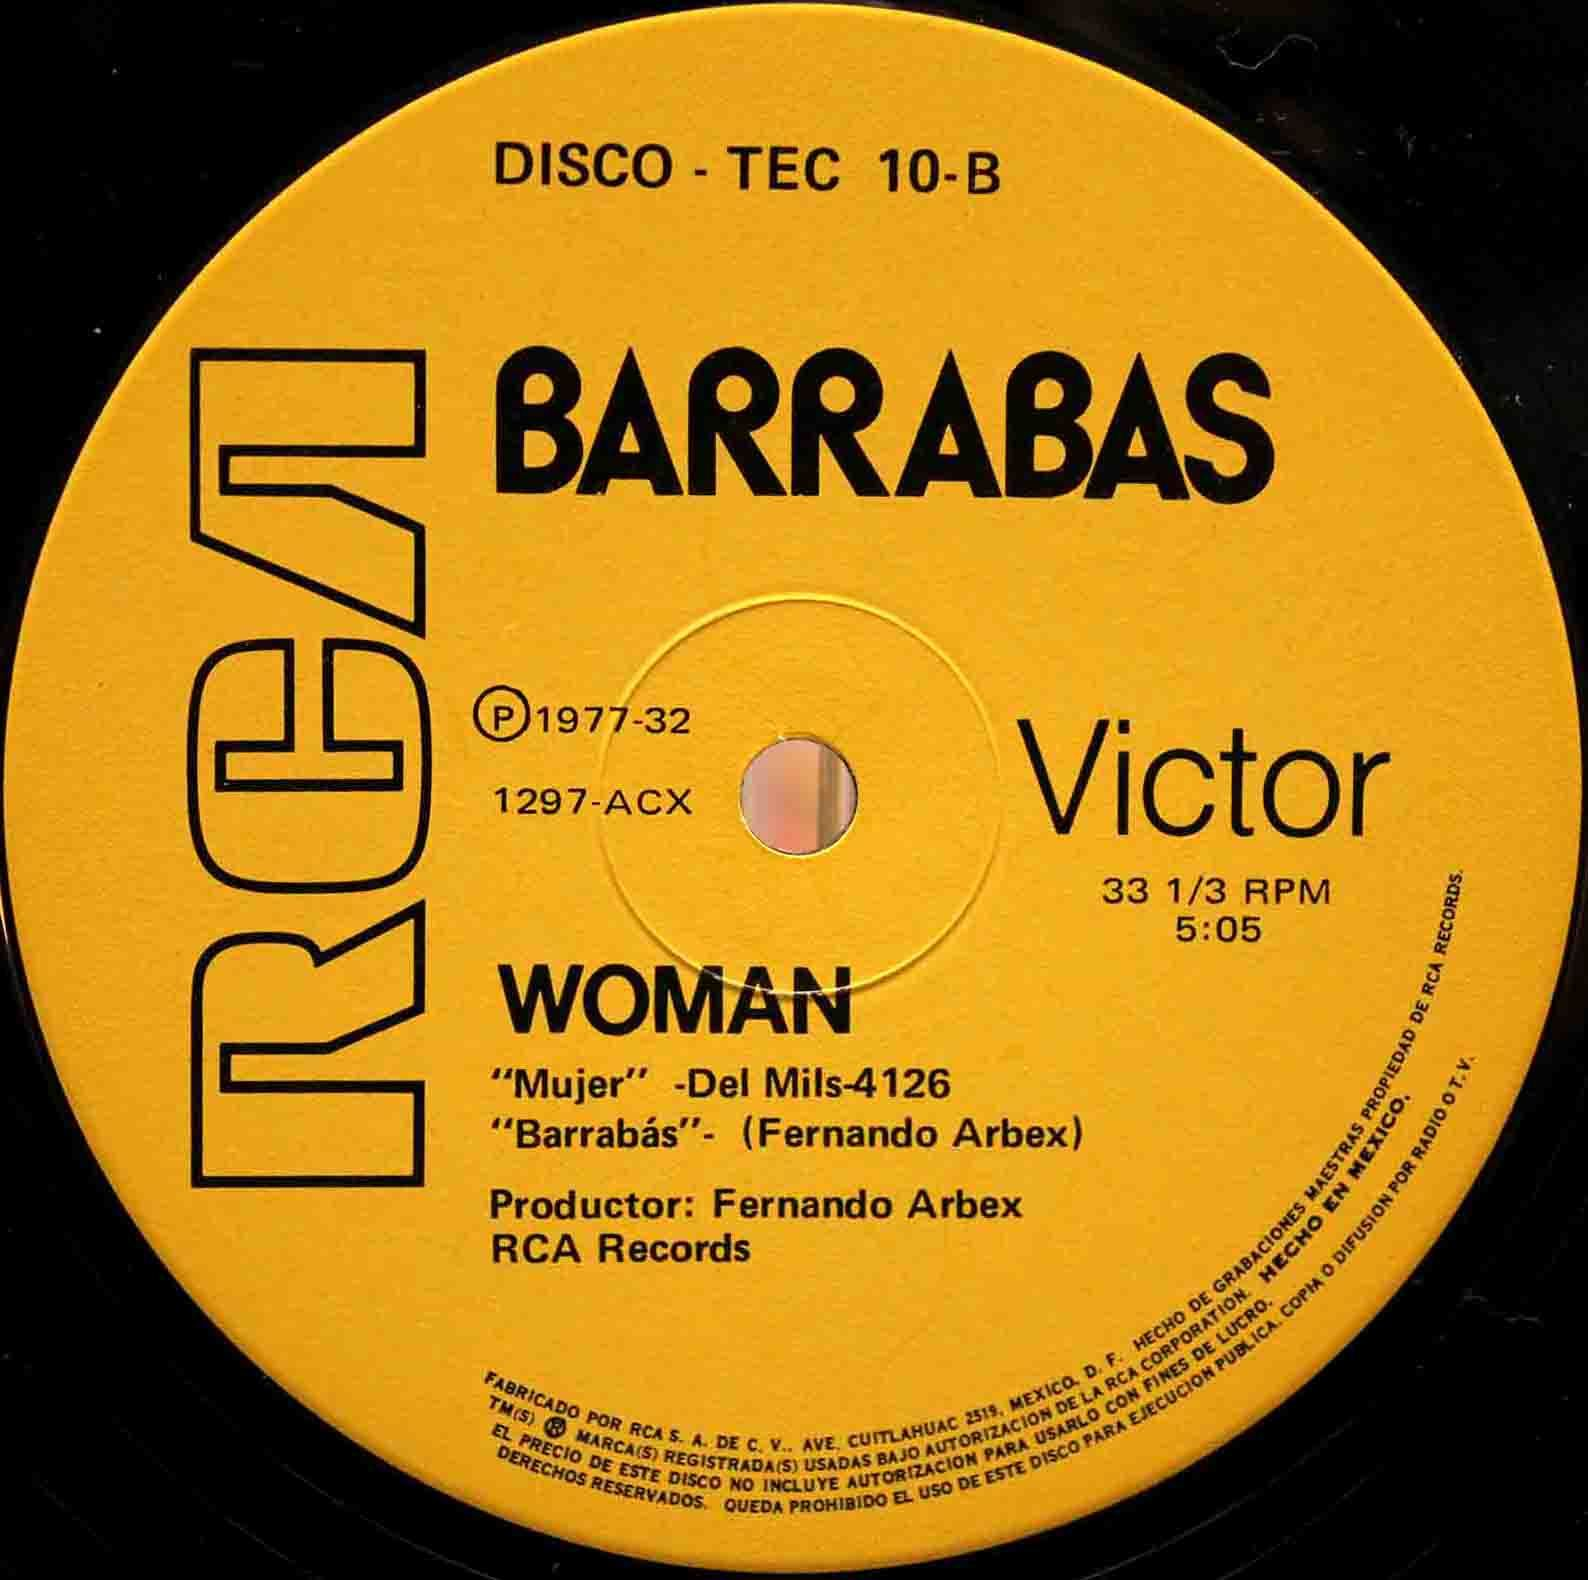 Barrabas Woman 03